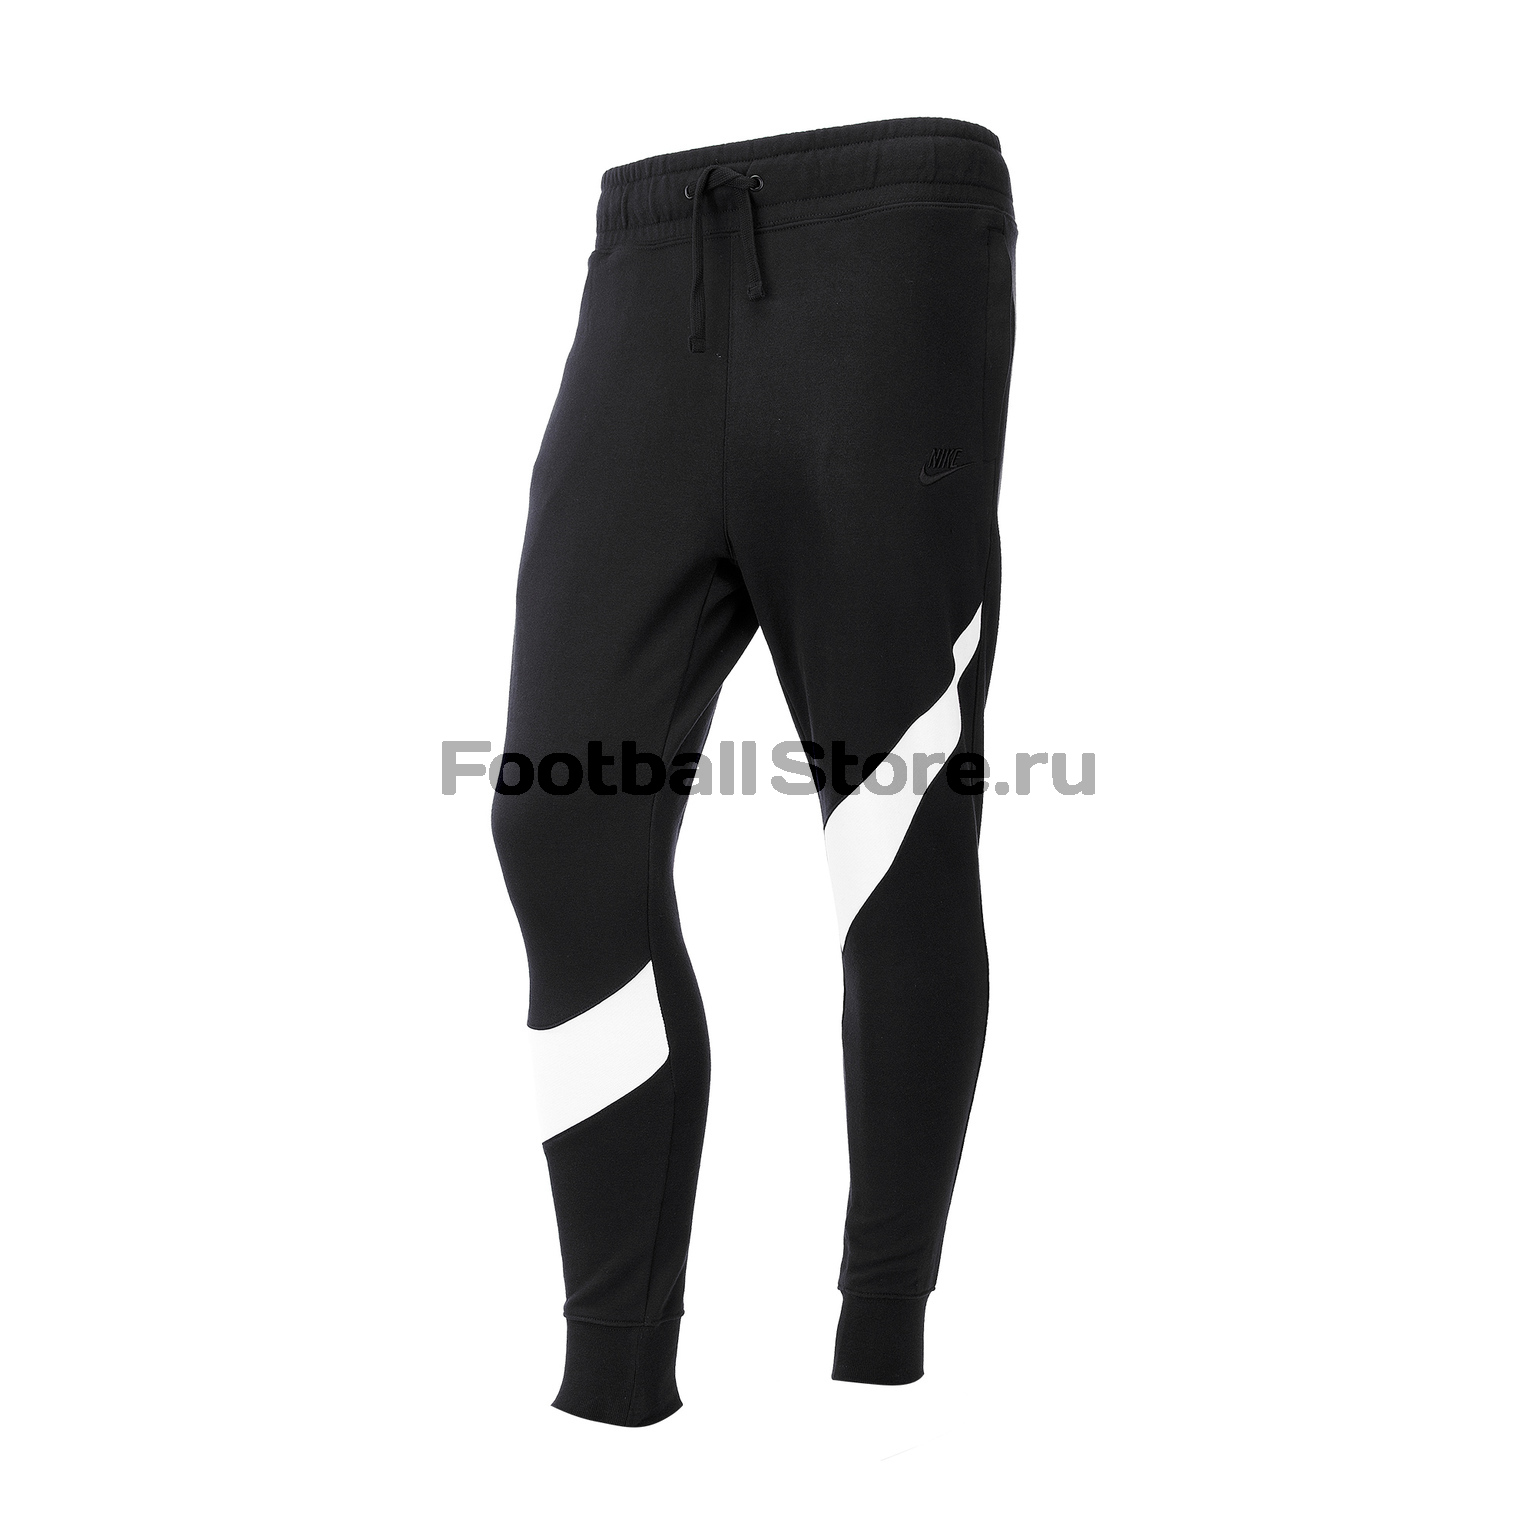 Брюки Nike HBR Pant AR3086-010